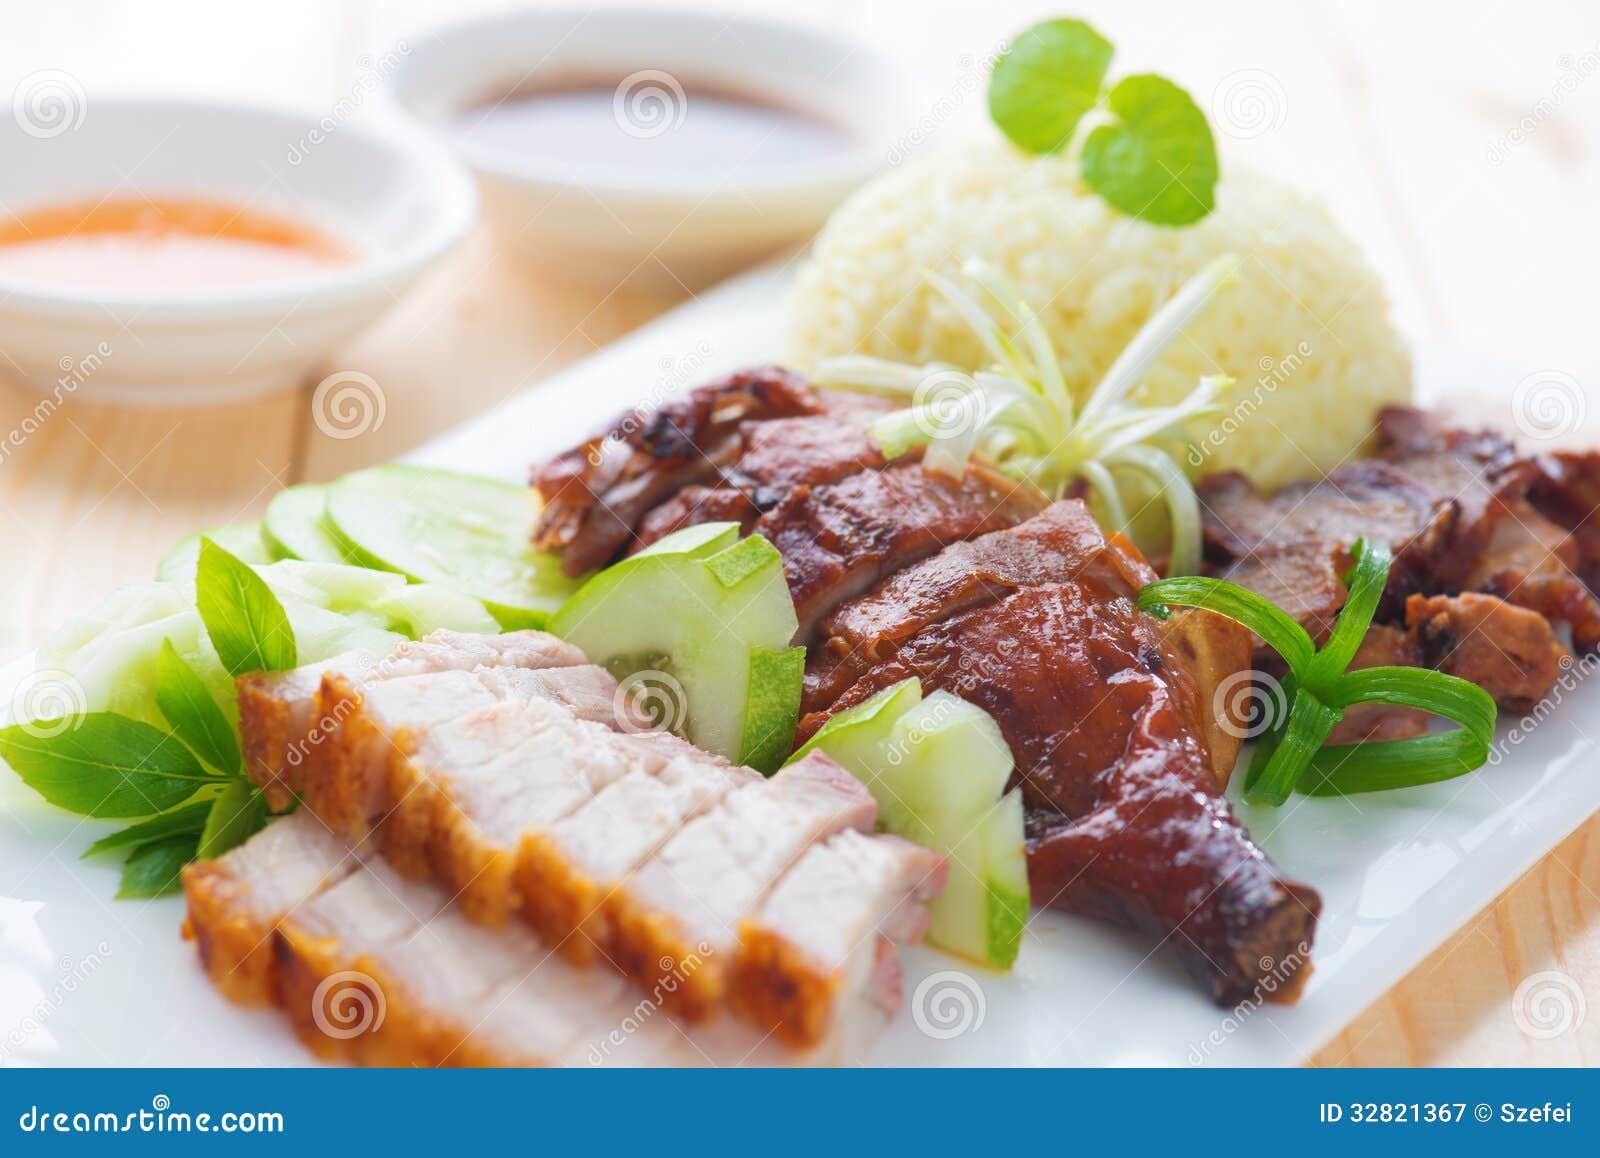 Roasted Duck, Roasted Pork Crispy Siu Yuk And Charsiu ...